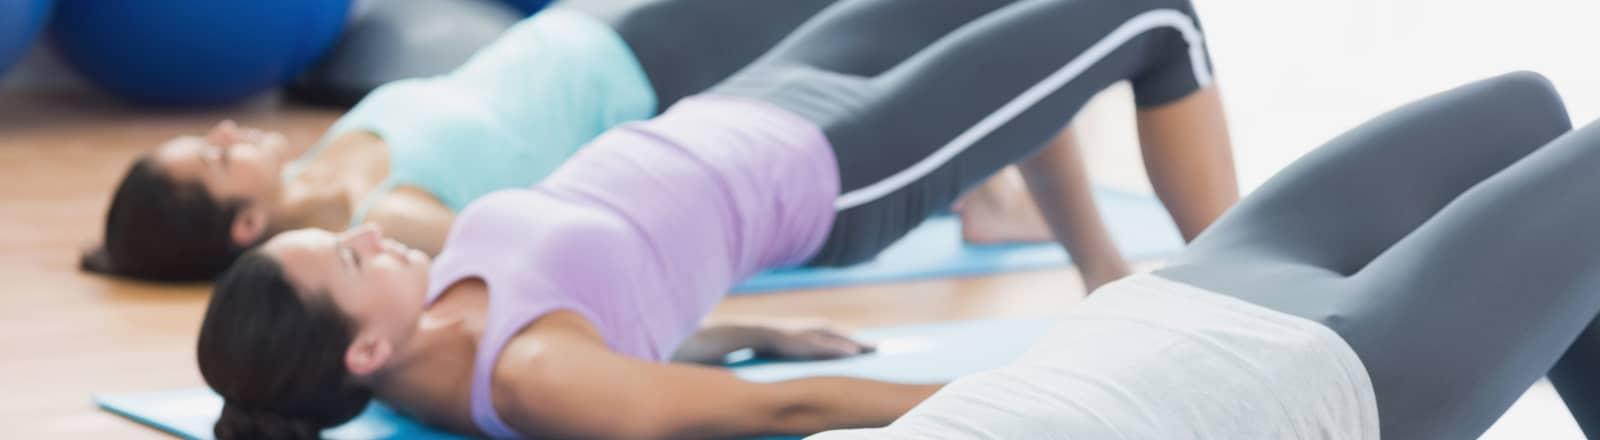 pilates terapéutico Palma